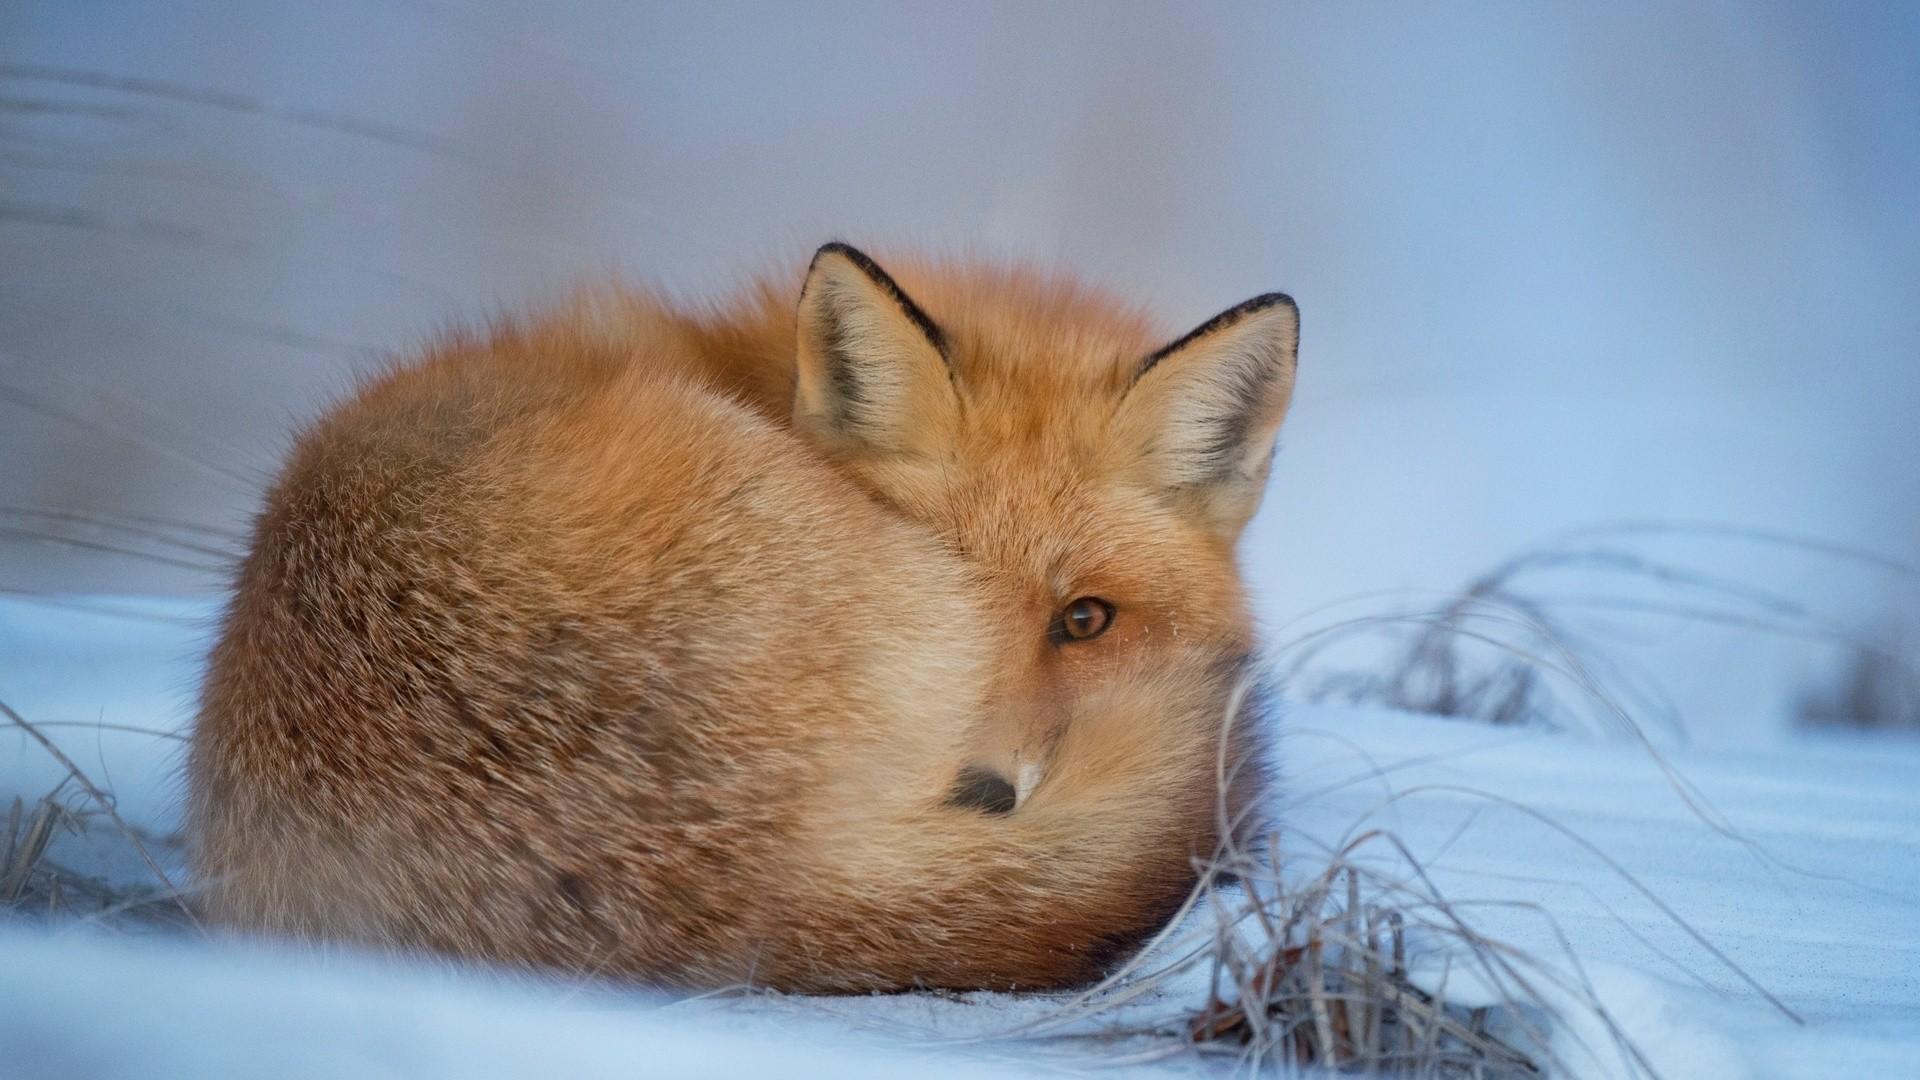 Winter Fox Wallpaper image hd